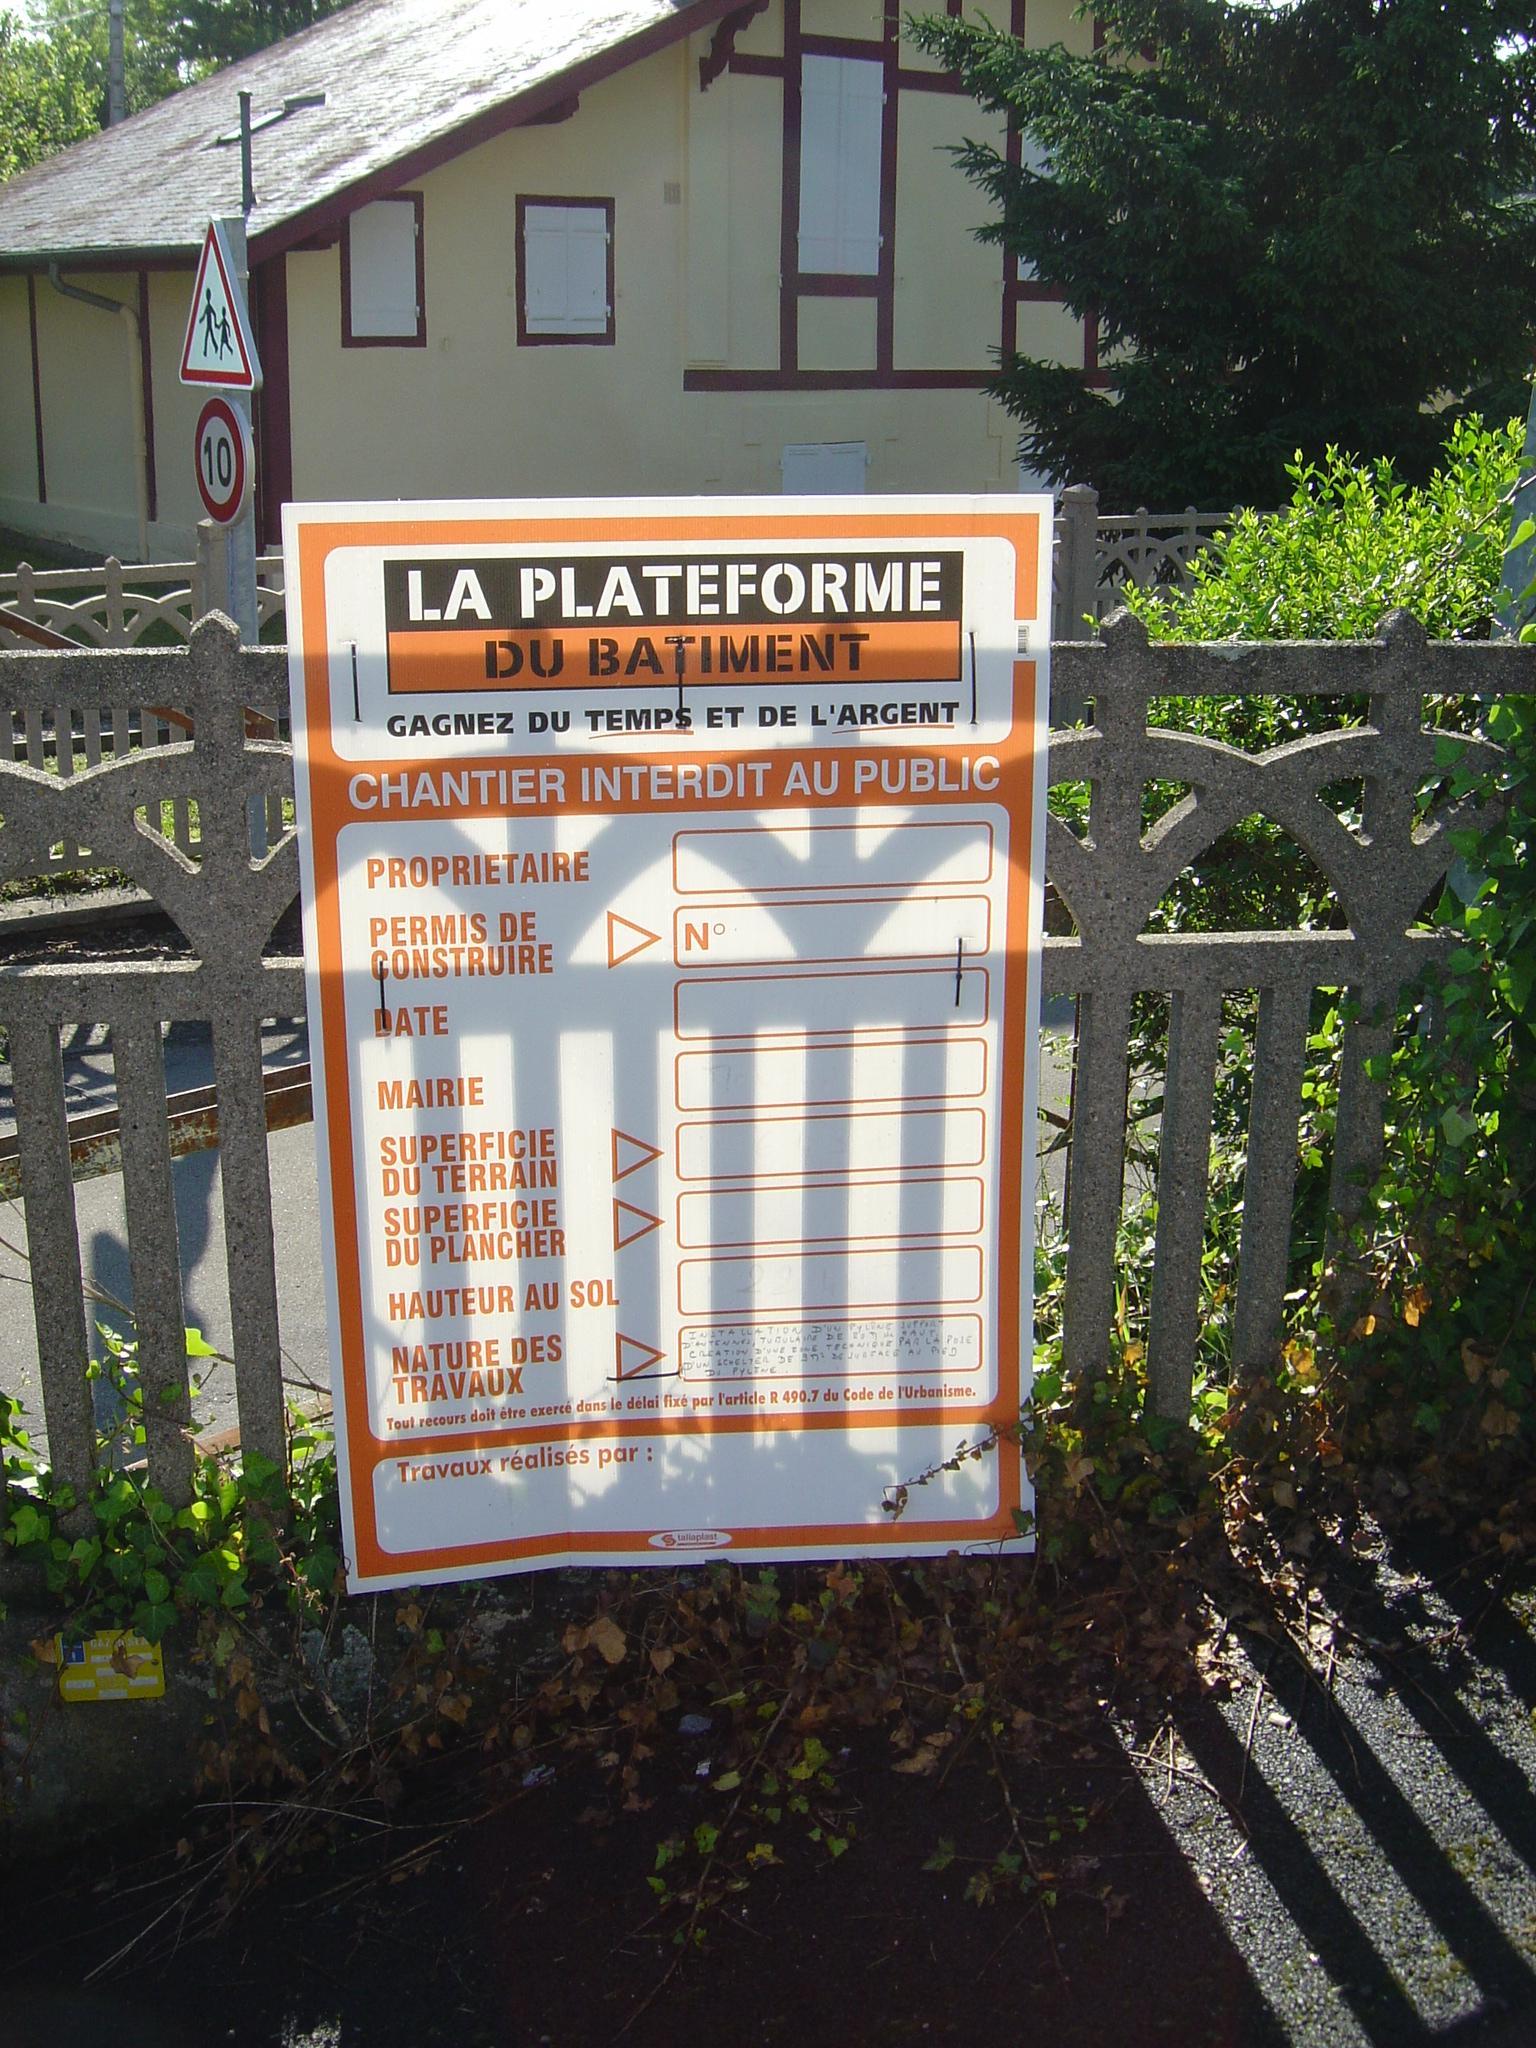 Montlu on rimard en images priartem - Panneau affichage declaration prealable ...